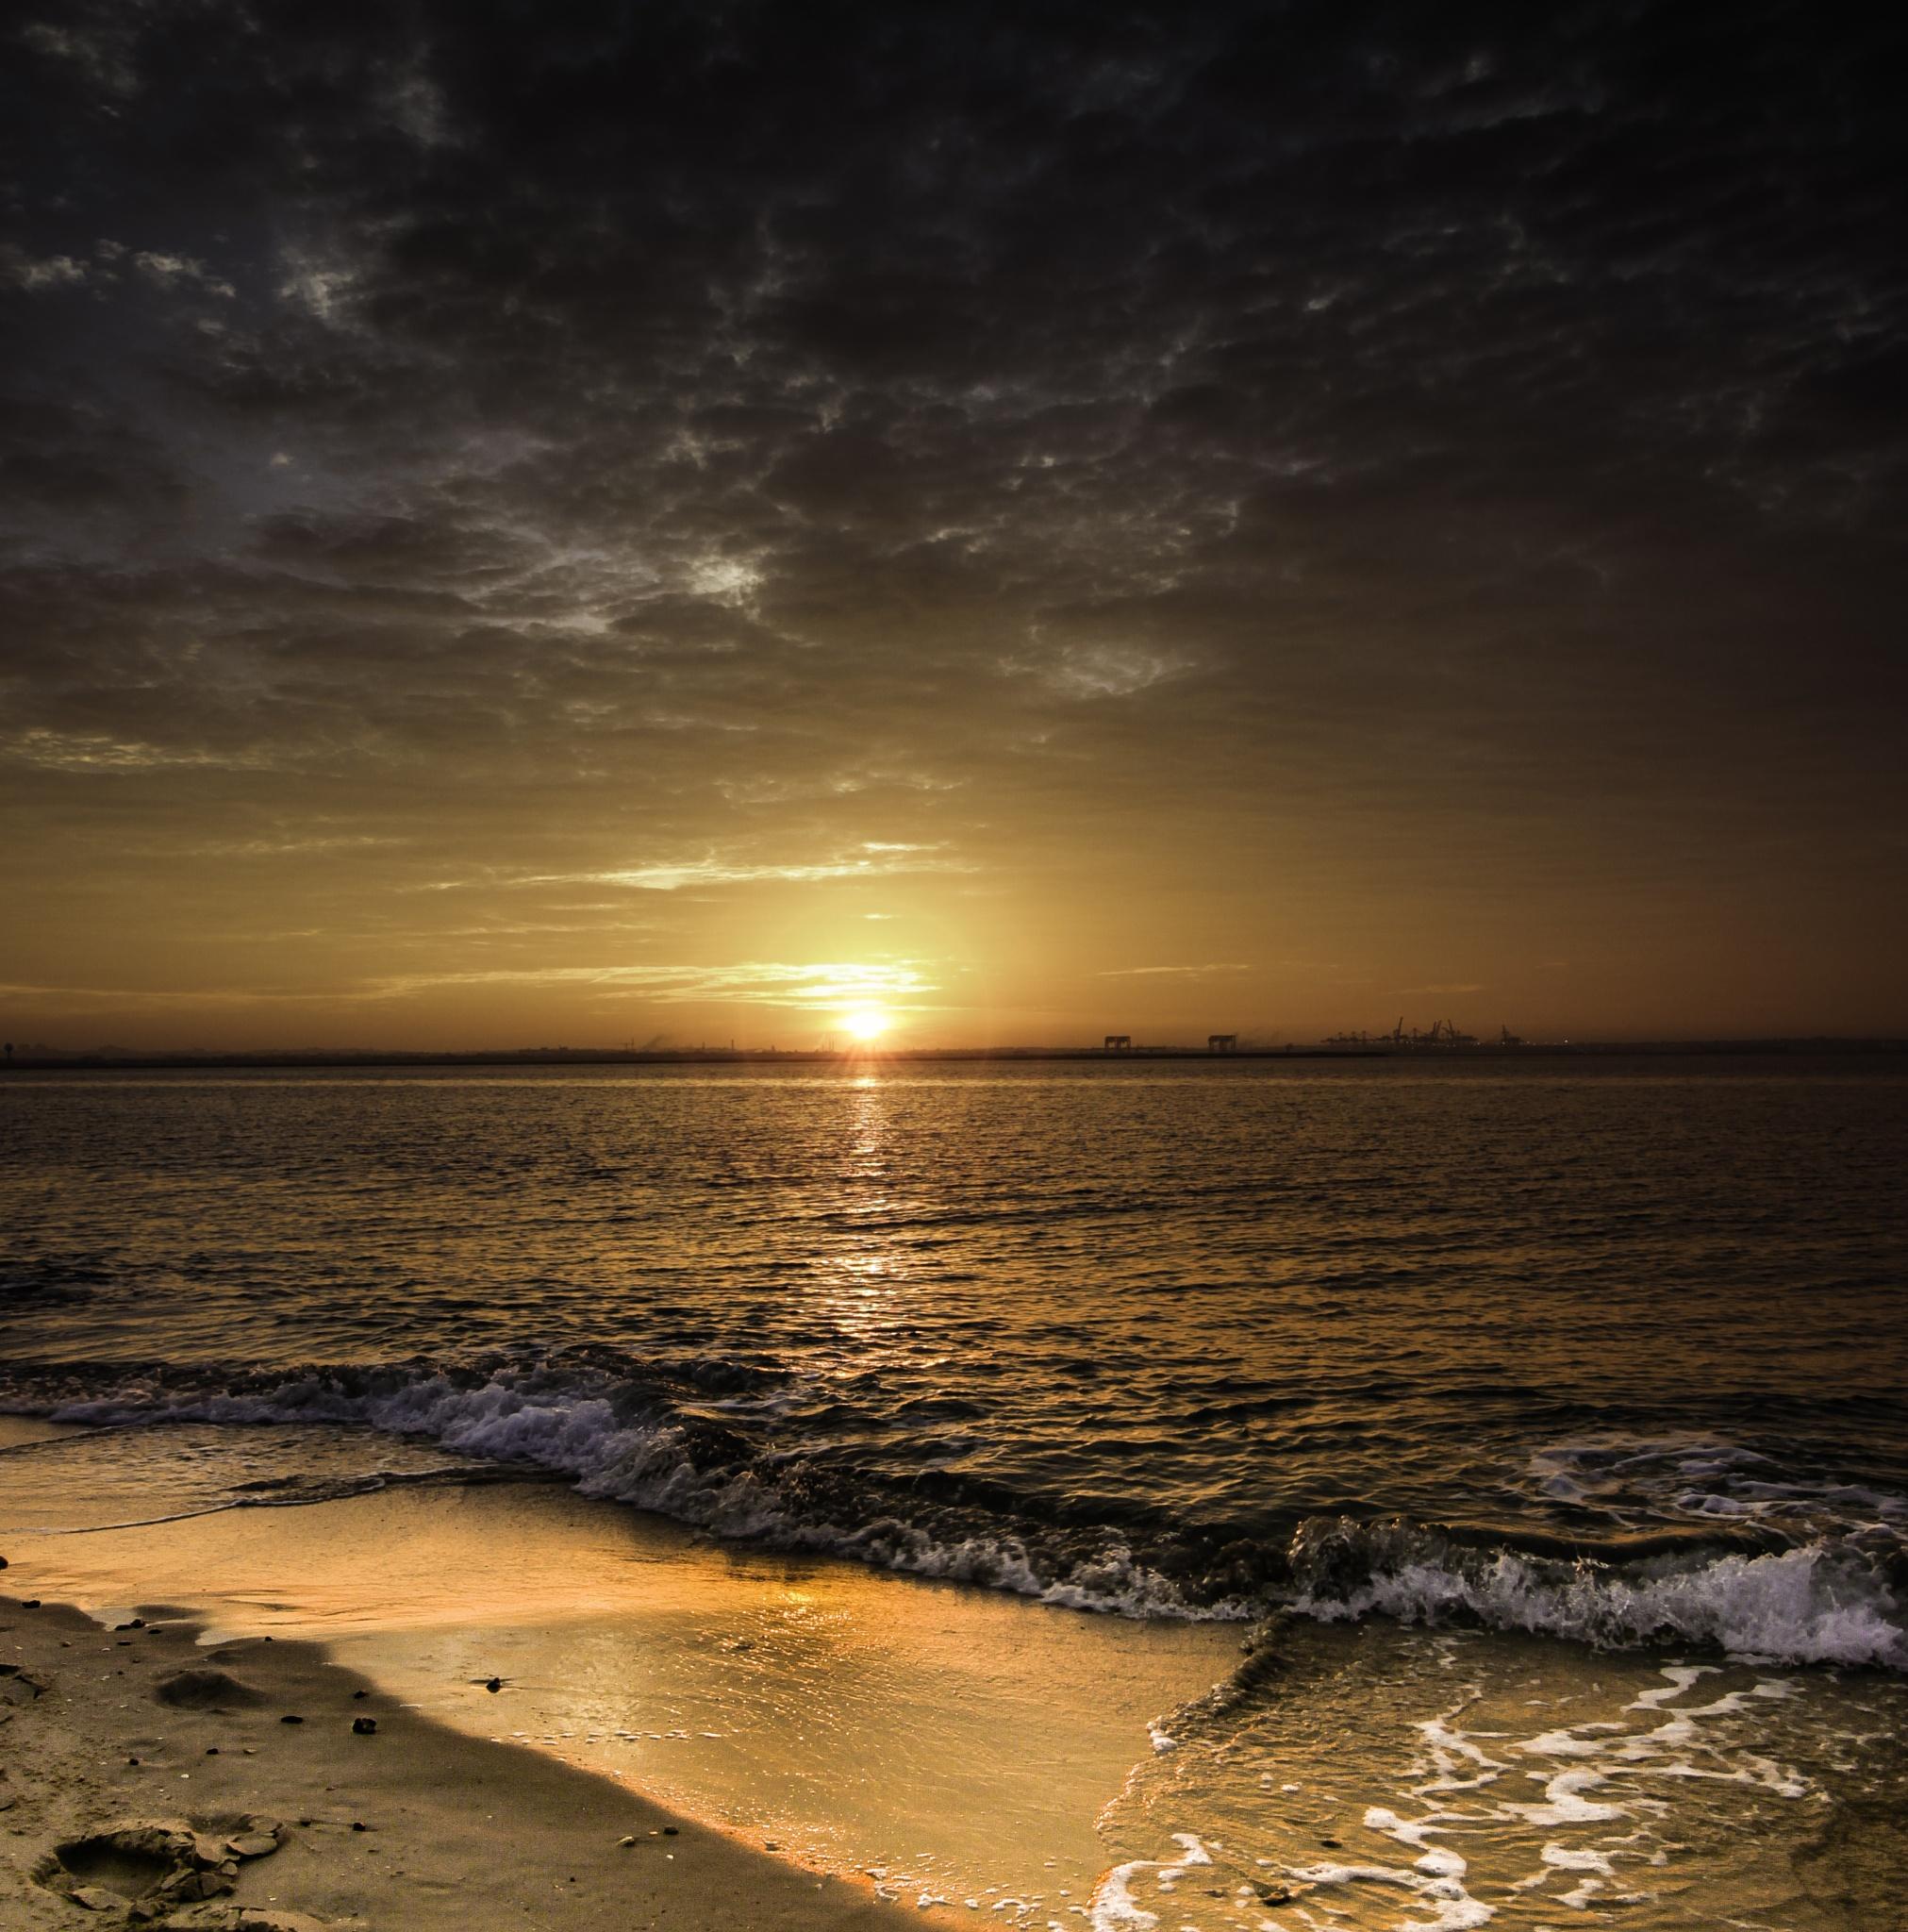 Botany Bay by Jai Ivanoff